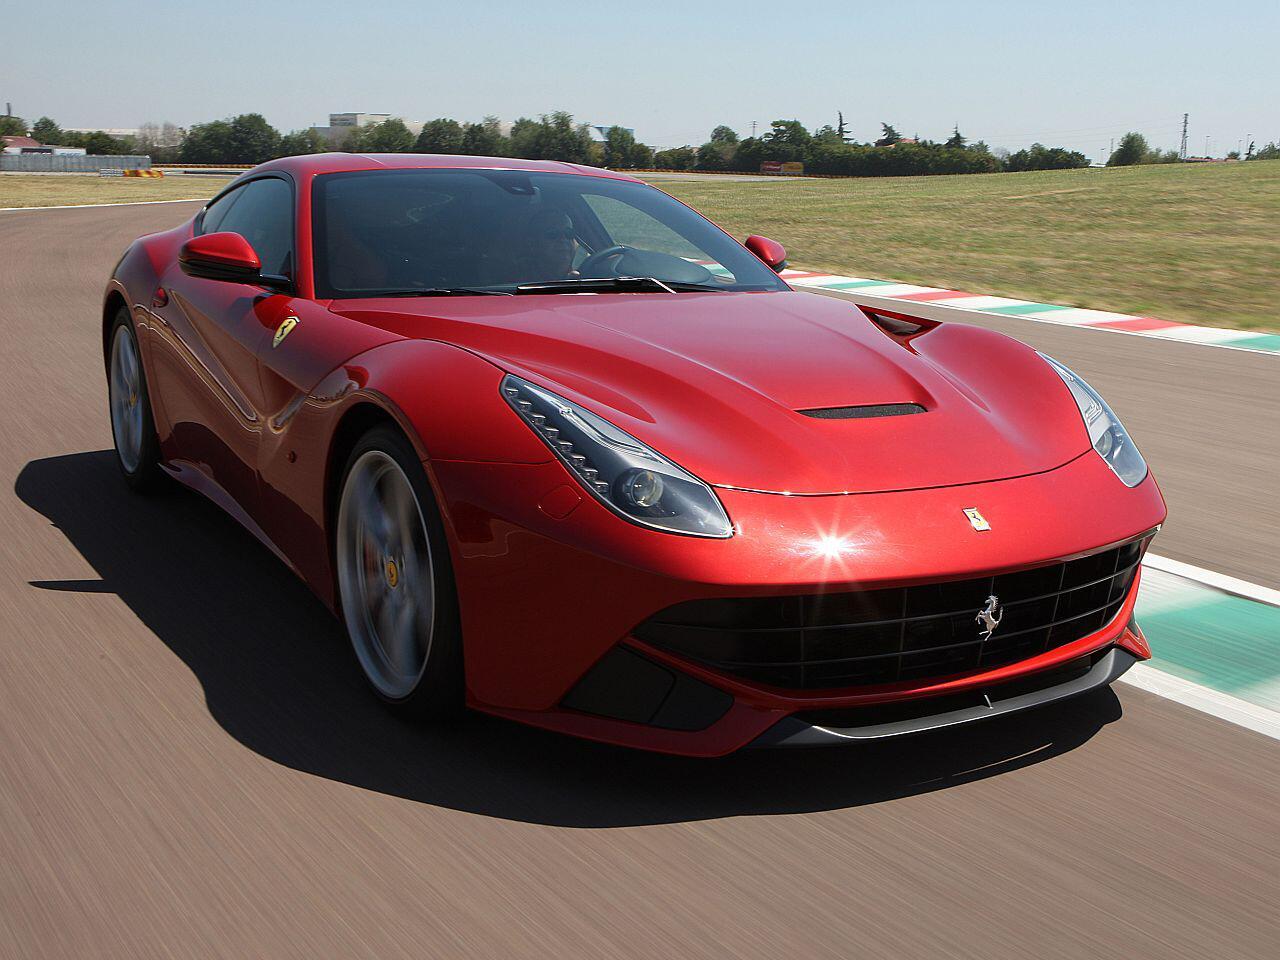 Bild zu Ferrari F12